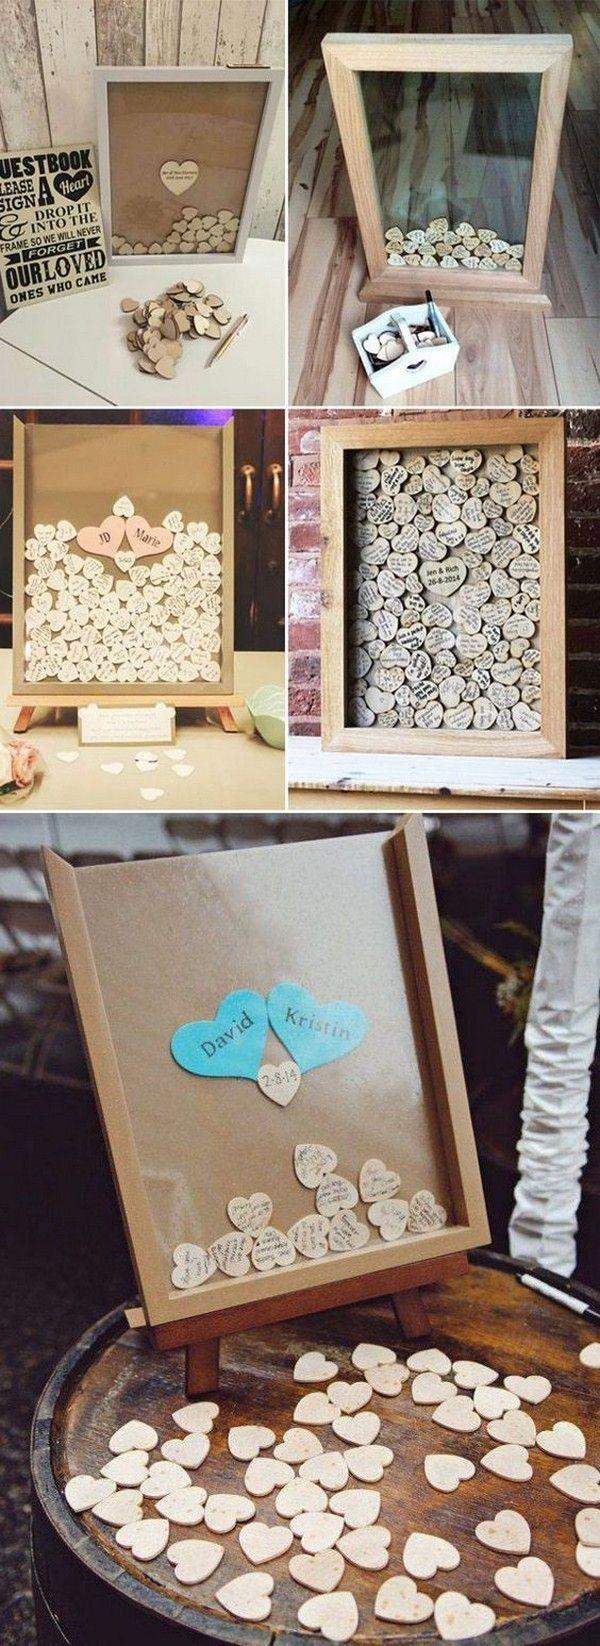 unique wedding guest book ideas #weddingideas #weddingguestbooks